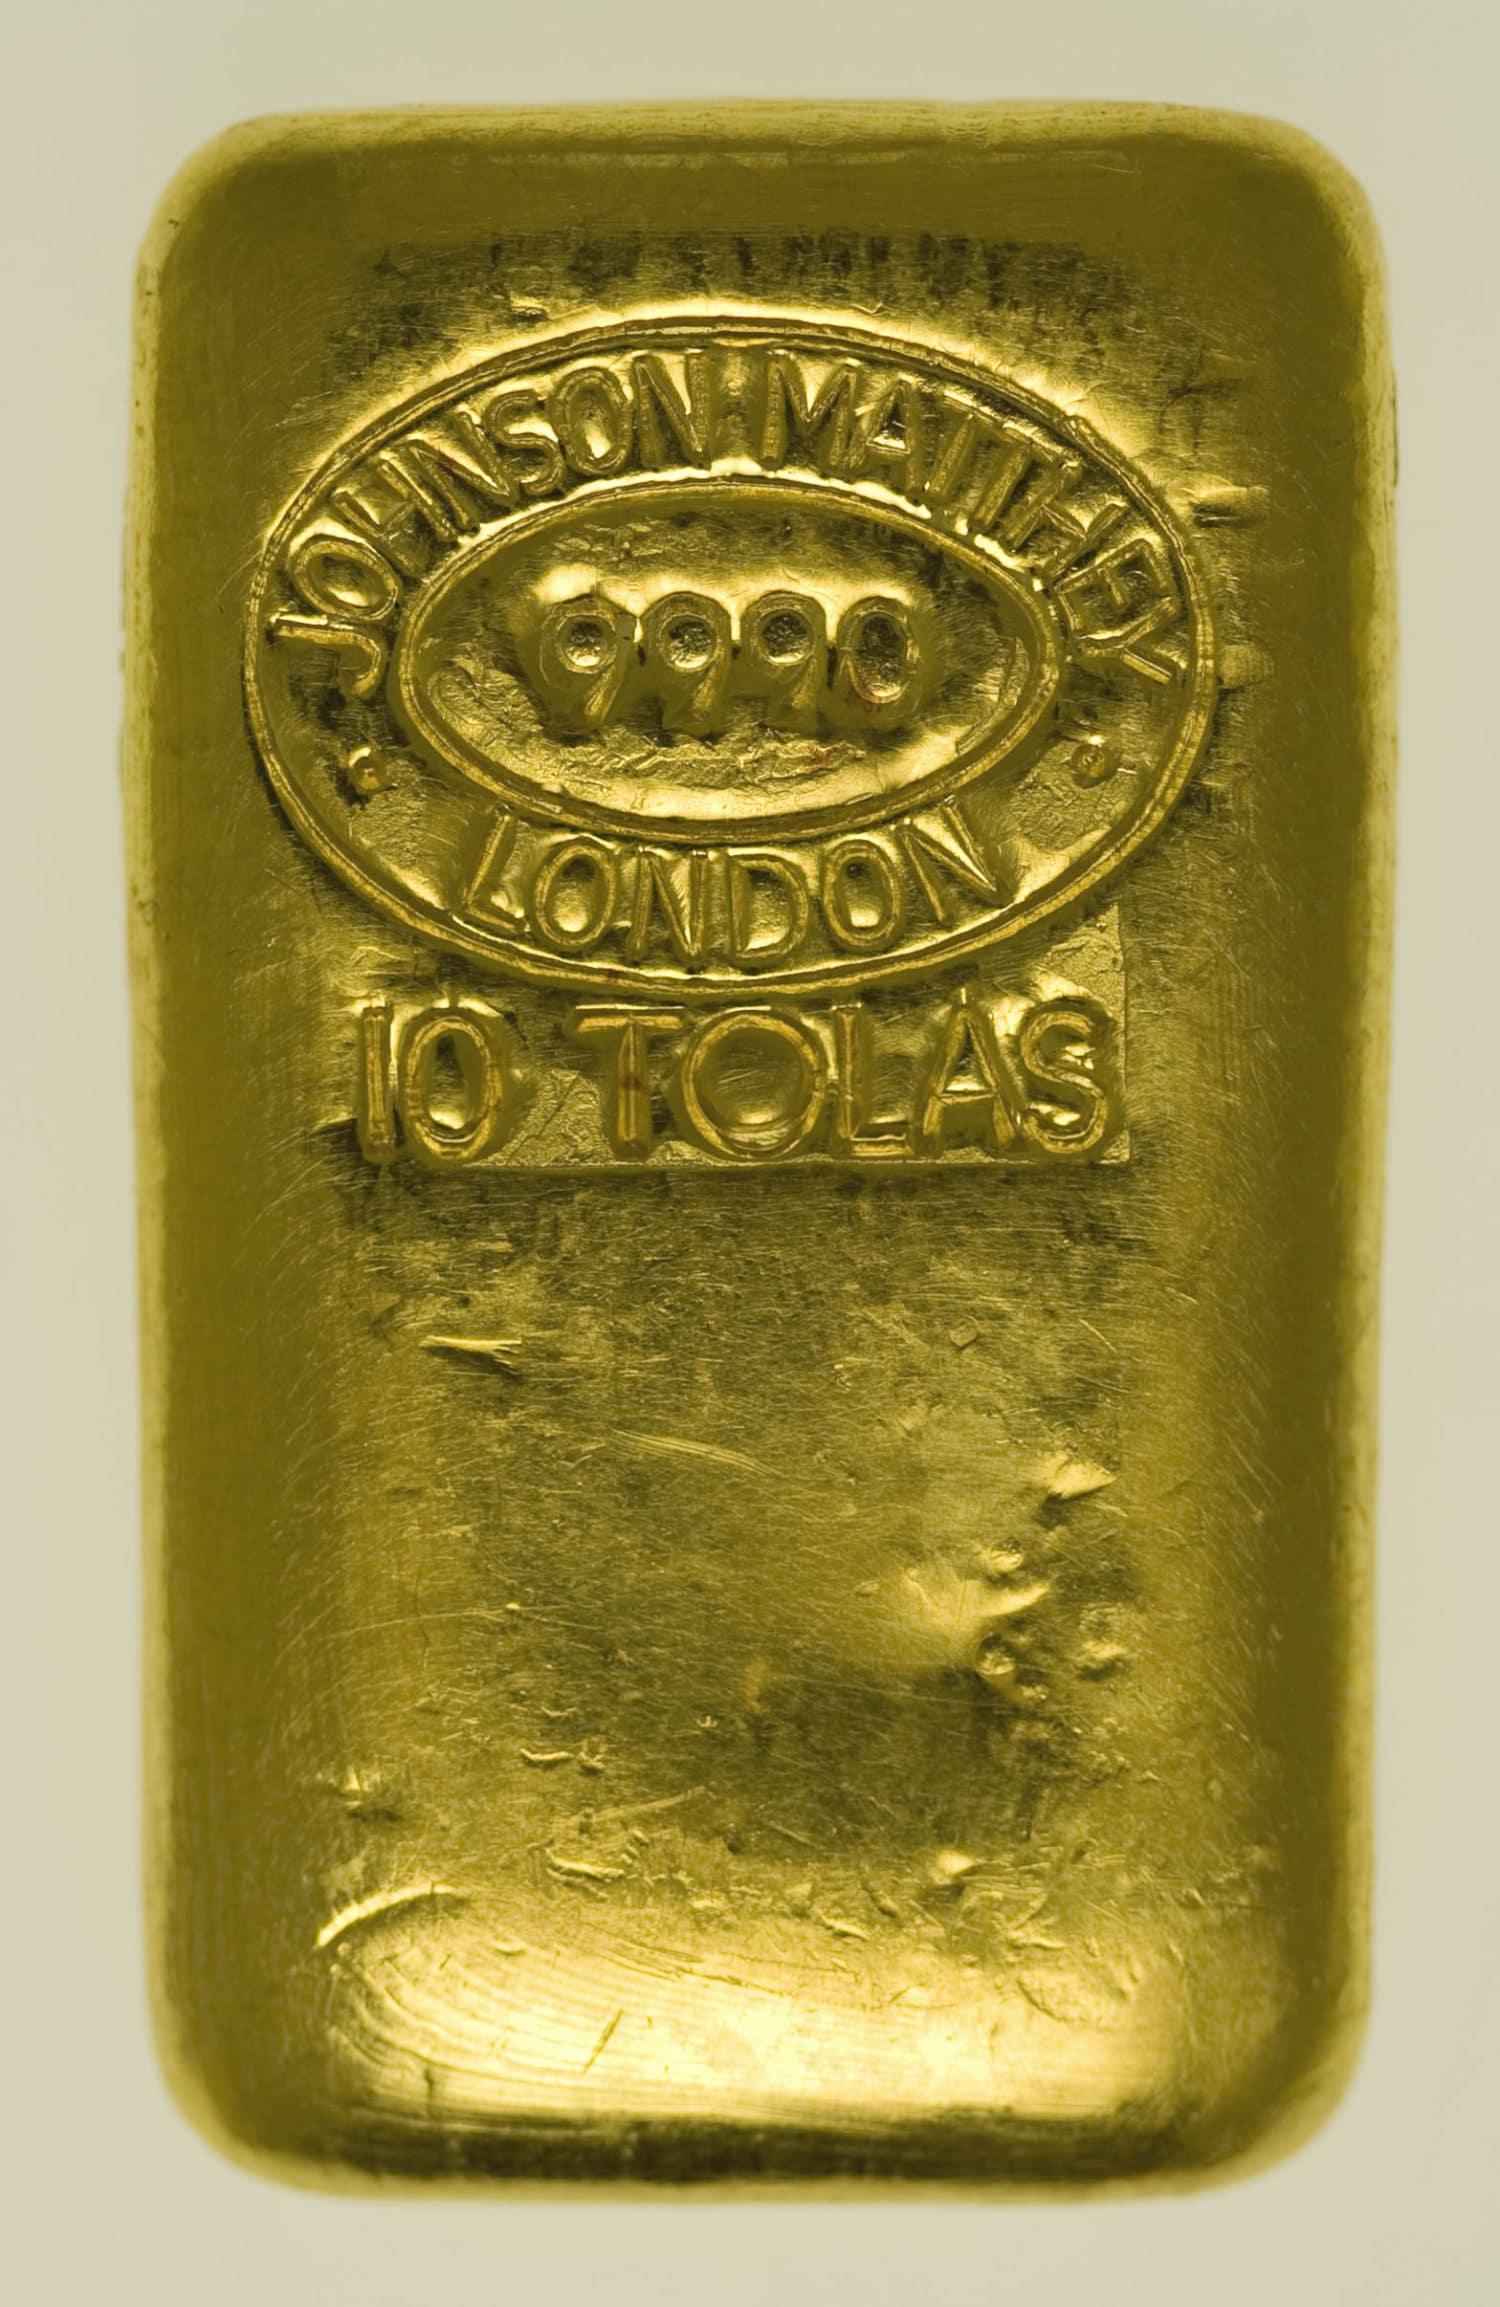 goldbarren - Goldbarren 10 Tolas Johnson Matthey